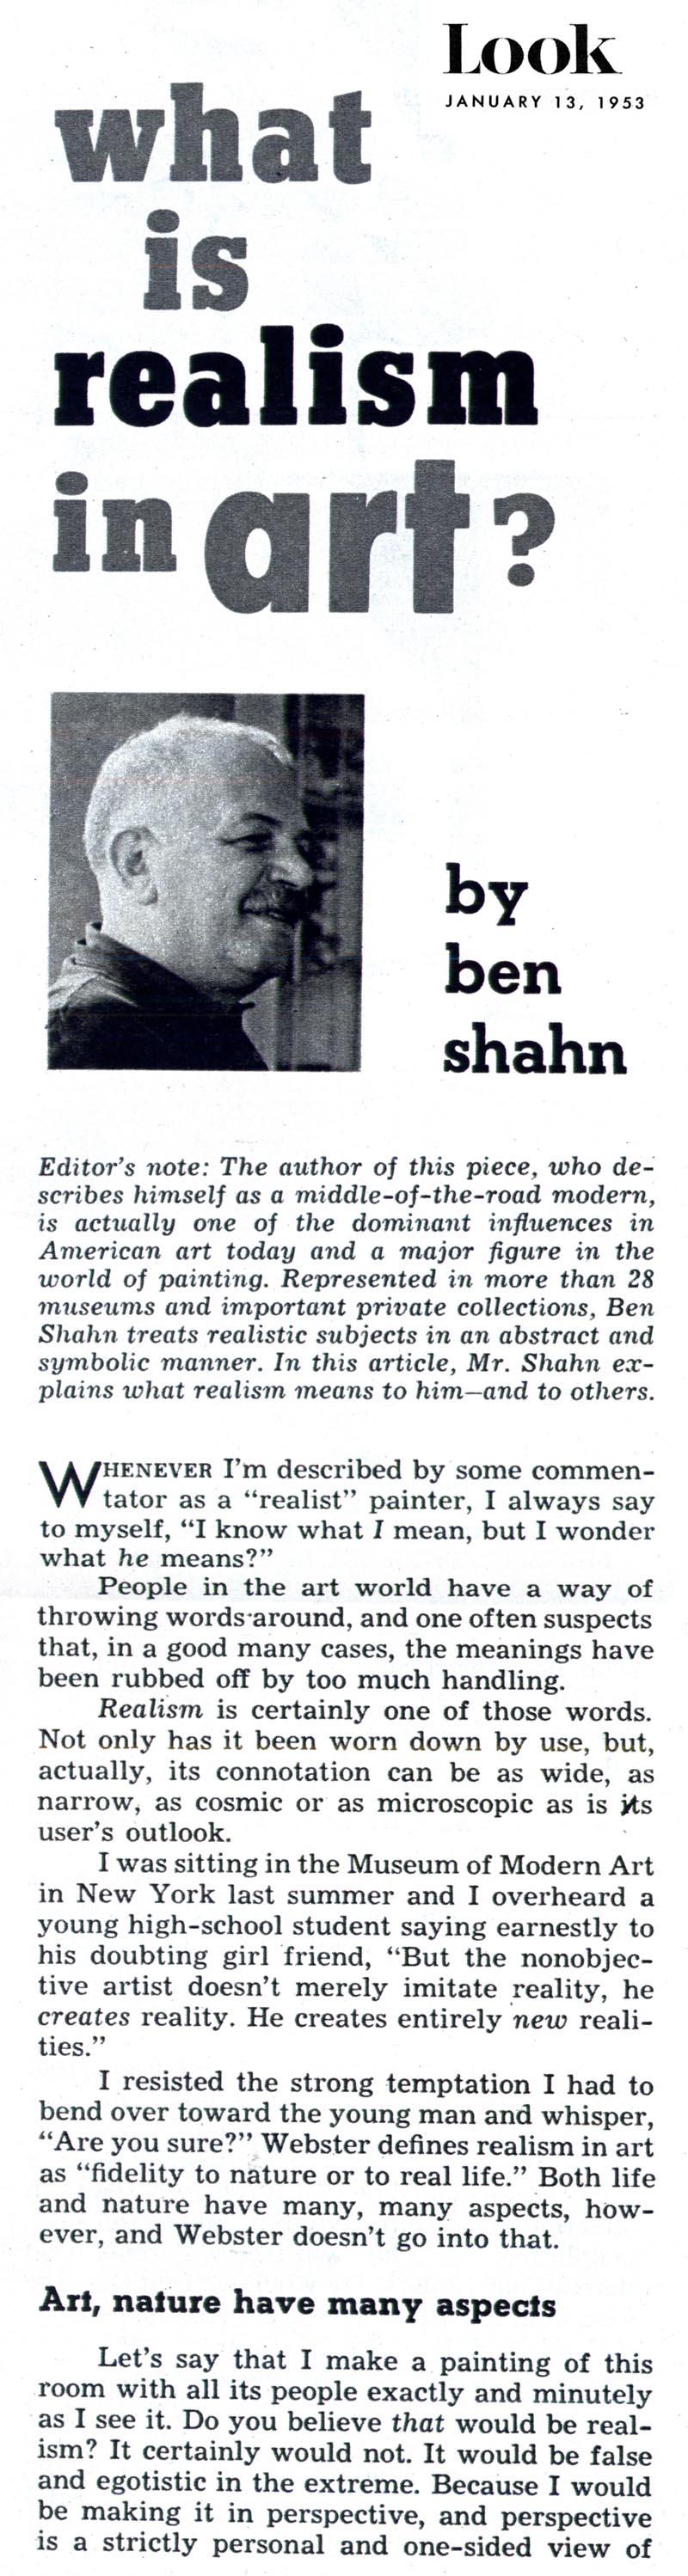 Shahn26.detail01